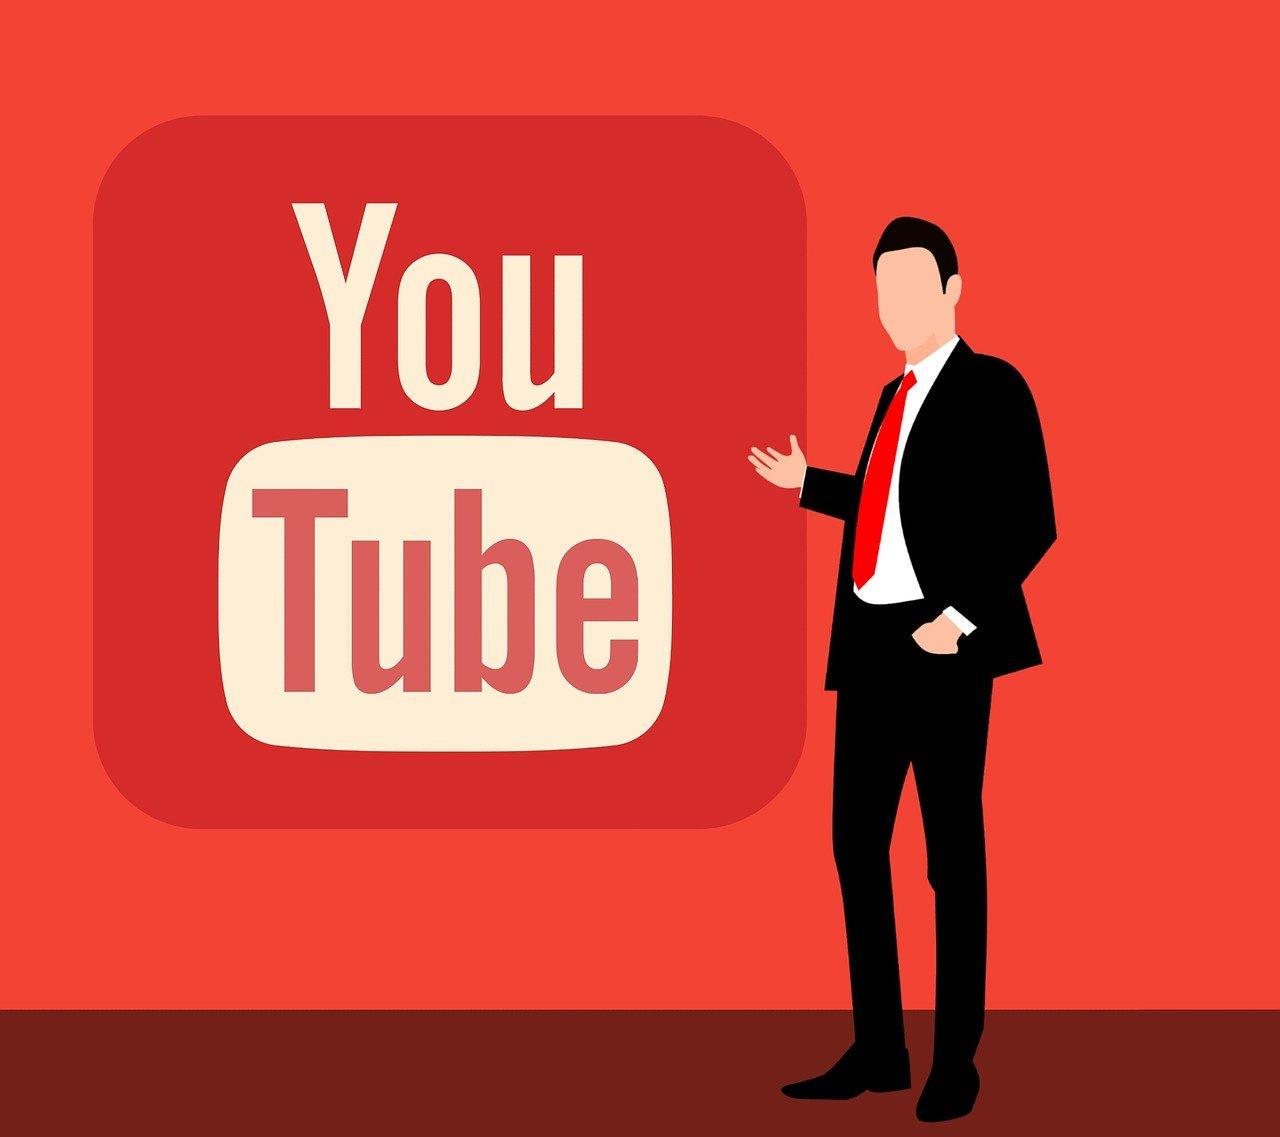 youtube-icon-gf9b4d5ba1_1280.jpg